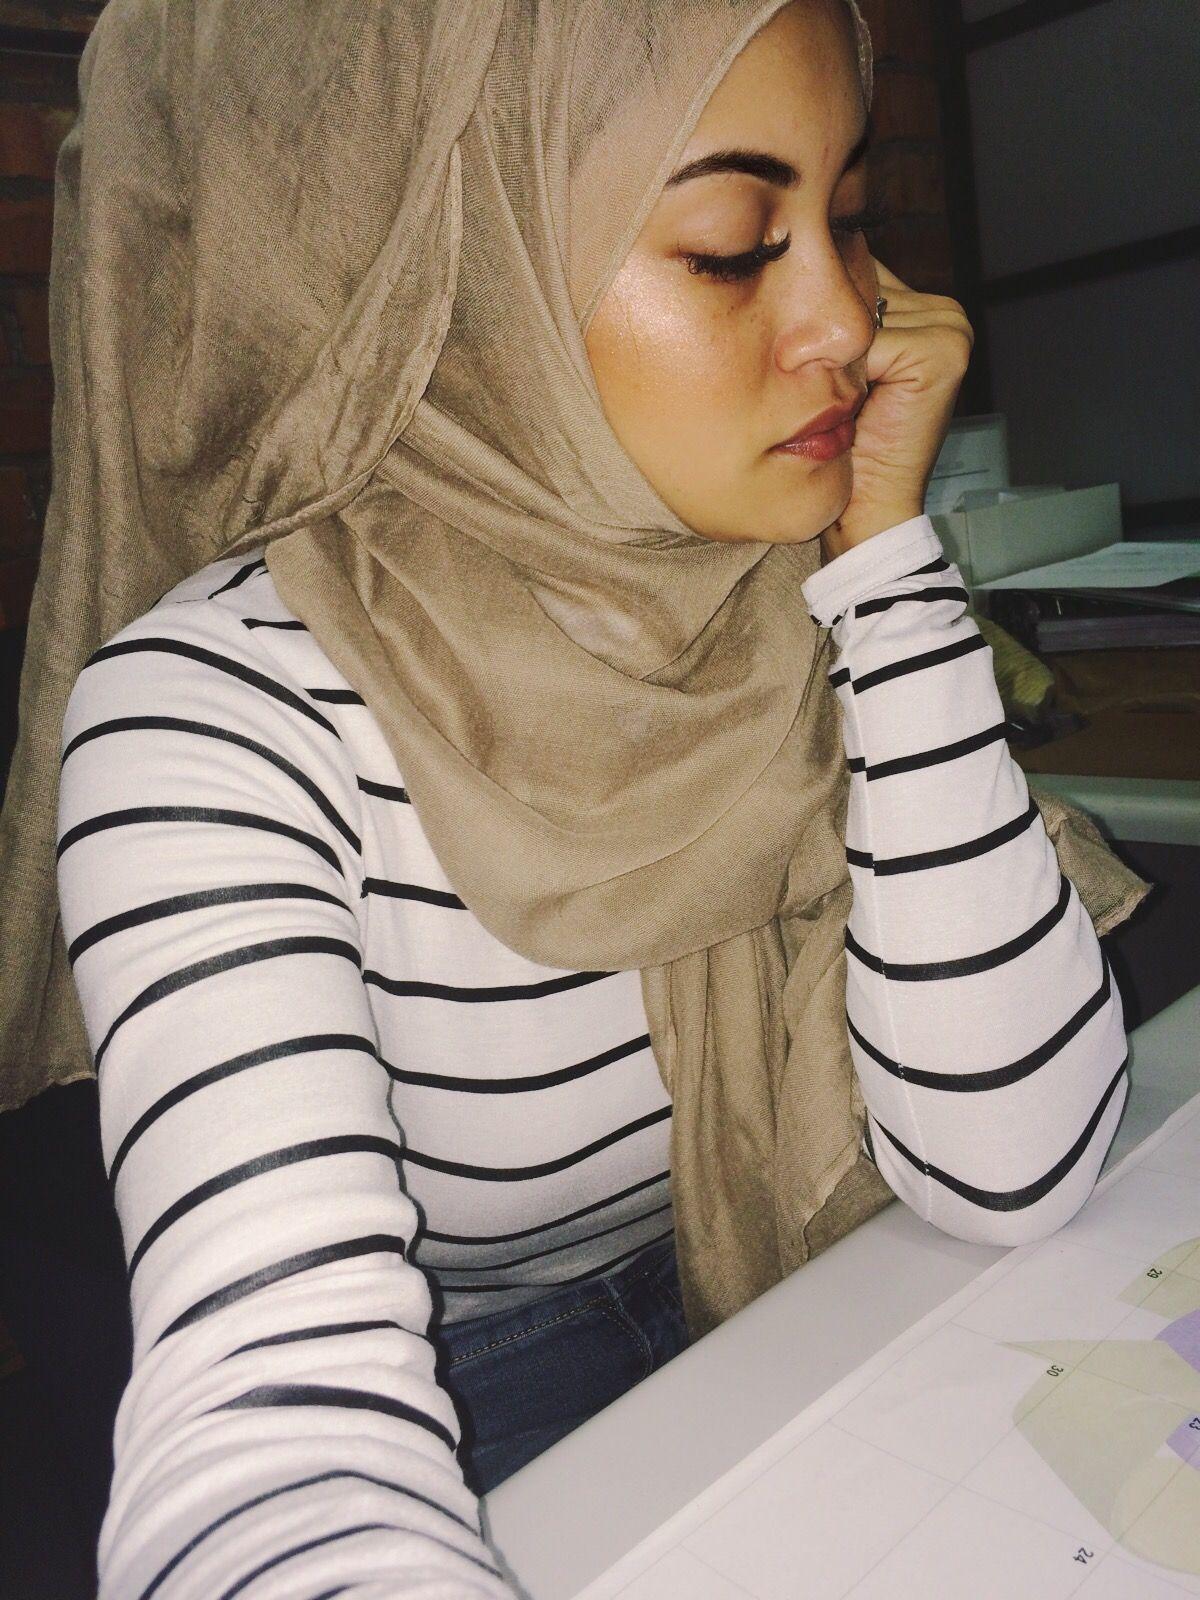 Nude hijab muslim girls selfie pics authoritative